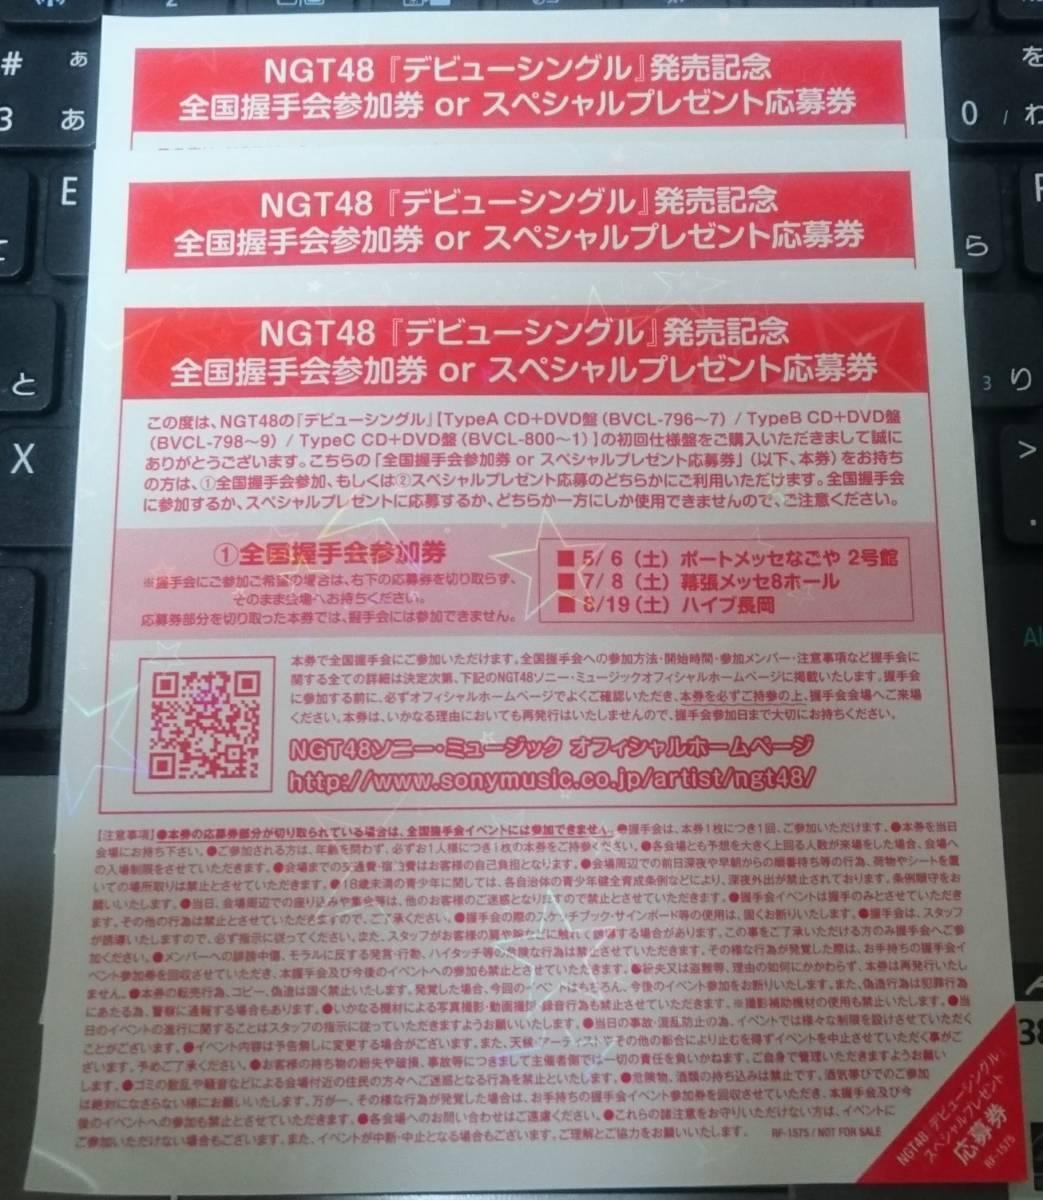 NGT48 デビューシングル 全国握手会参加券 3枚セット 送料込 ライブグッズの画像